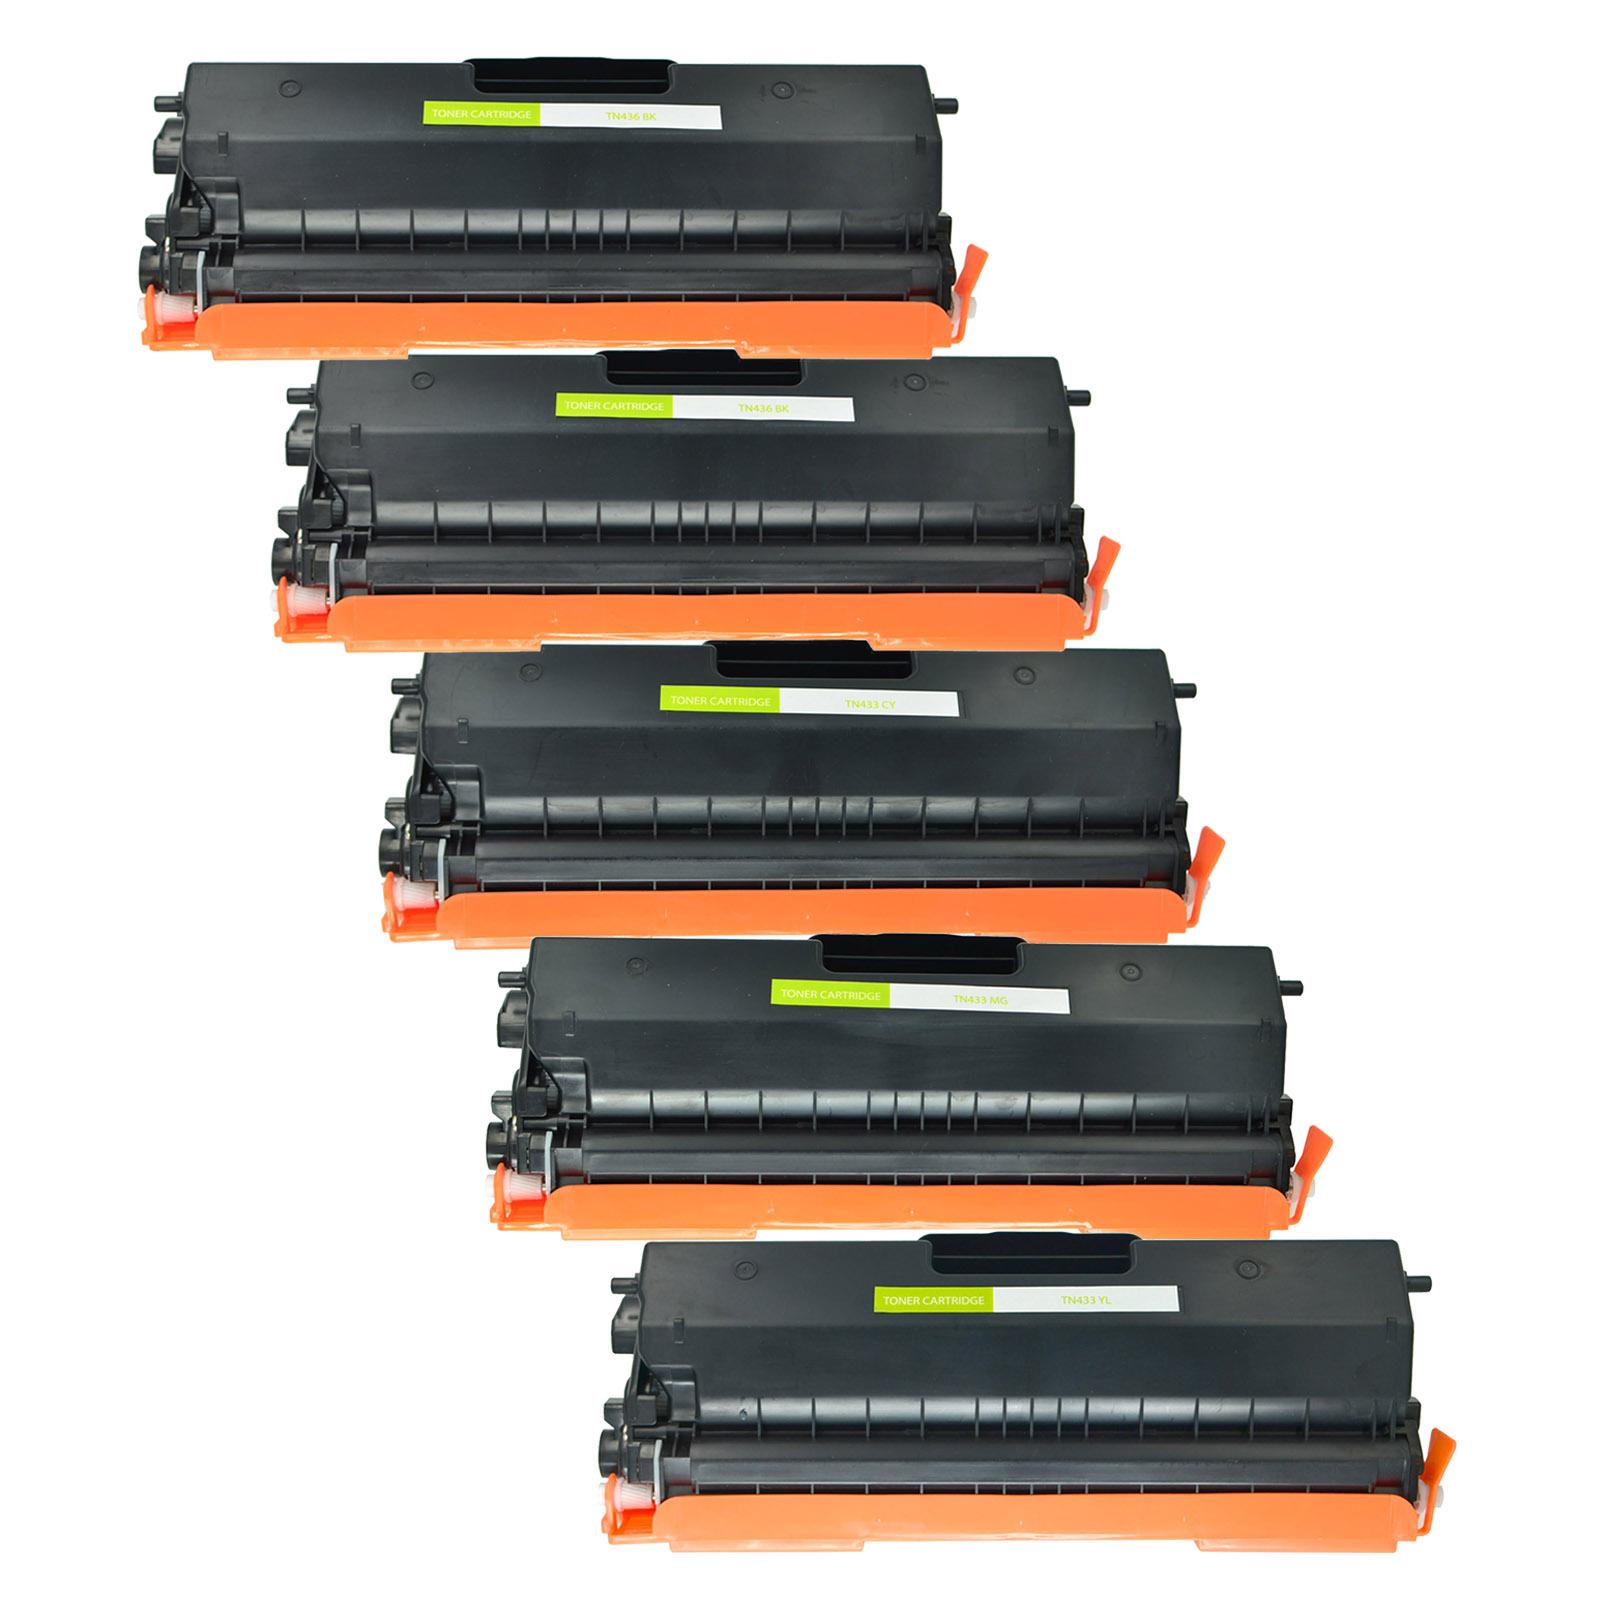 1PK TN436 Magenta Toner For Brother HL-L8260CDW 8360CDW MFC-L8690CDW L8900CDW